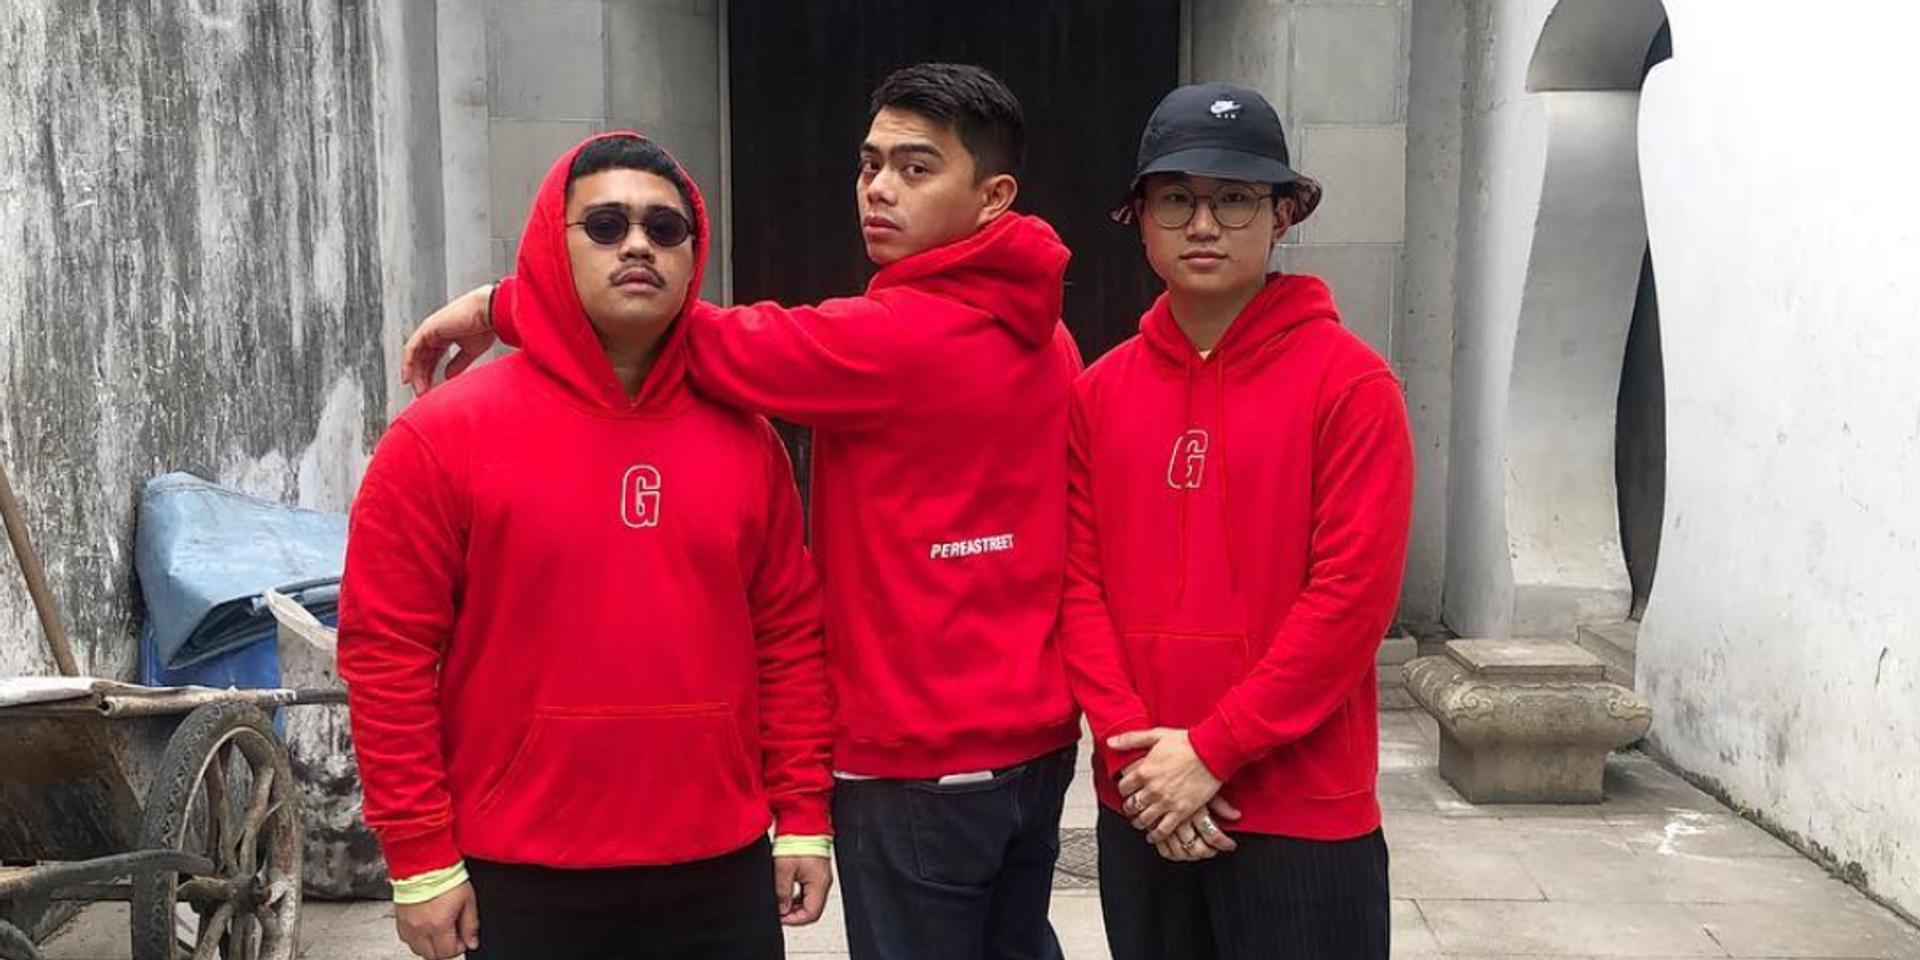 Perea Street shares Mong Alcaraz-produced track, 'G' – listen